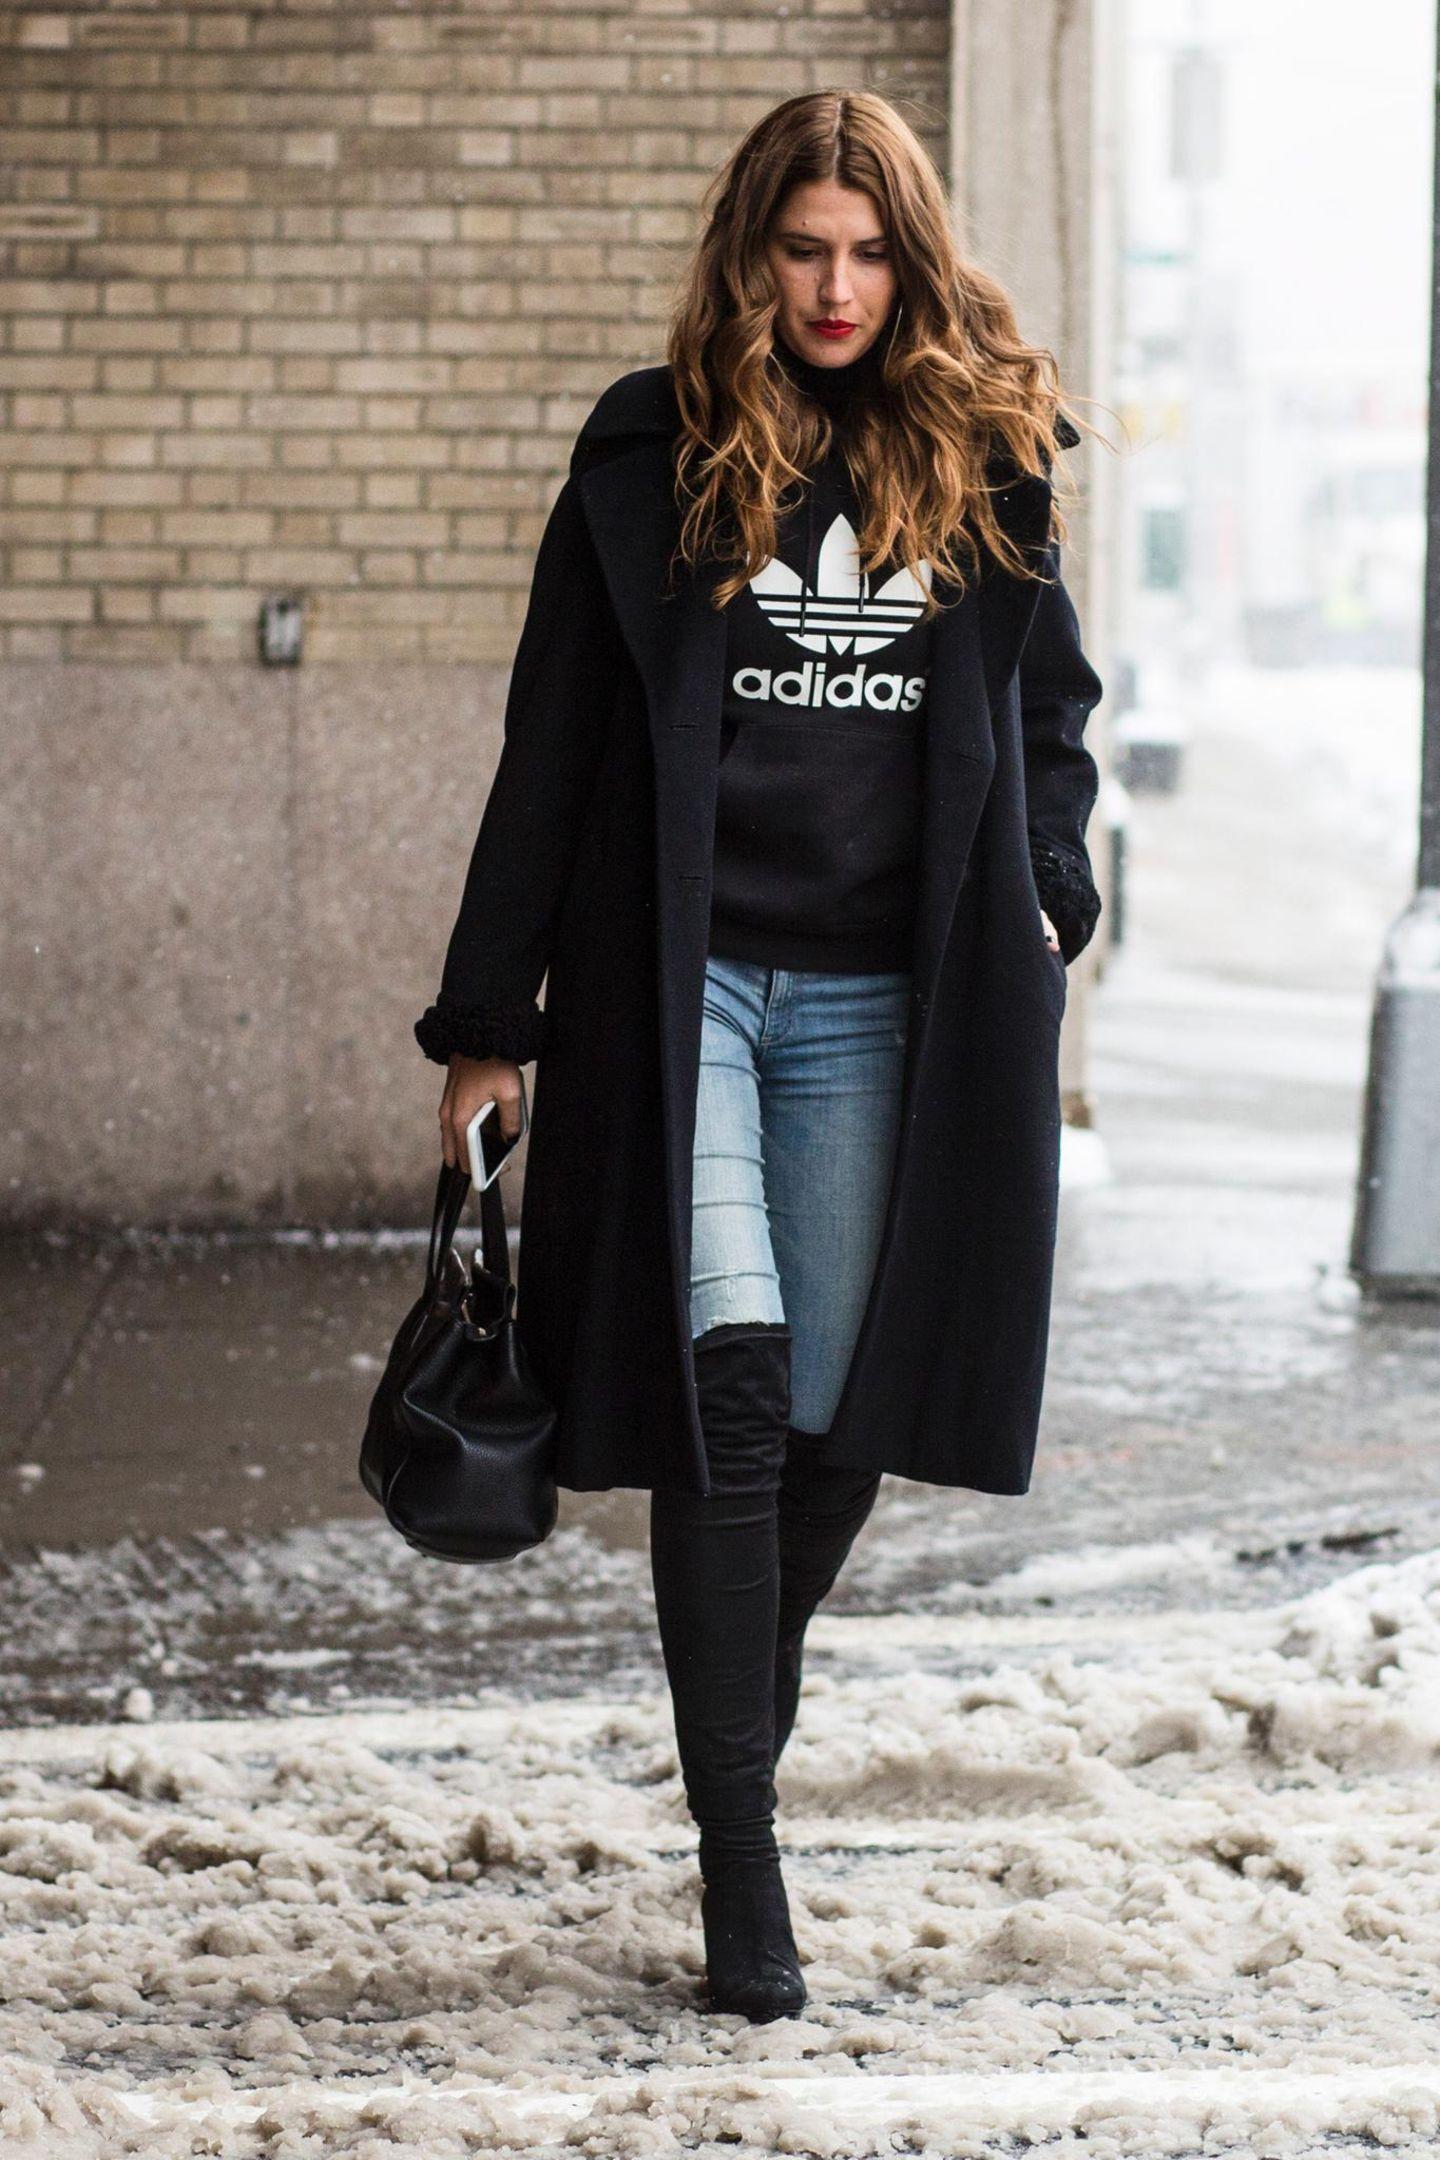 Bloggerin mit Logo-Sweater